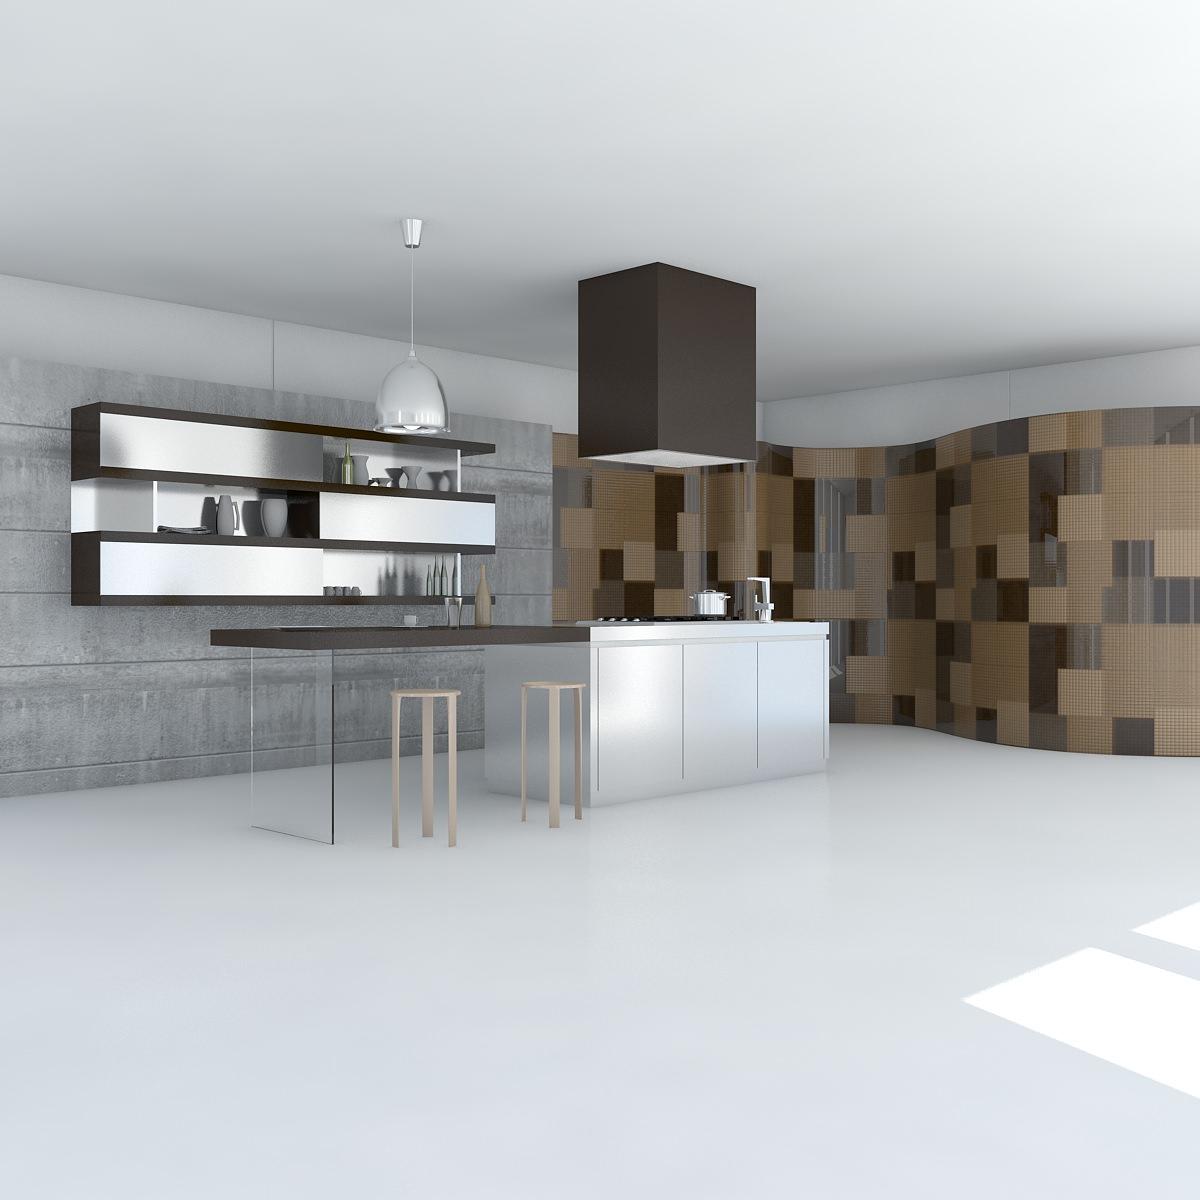 Kitchen Minimal Scene 3D Model MAX OBJ 3DS FBX